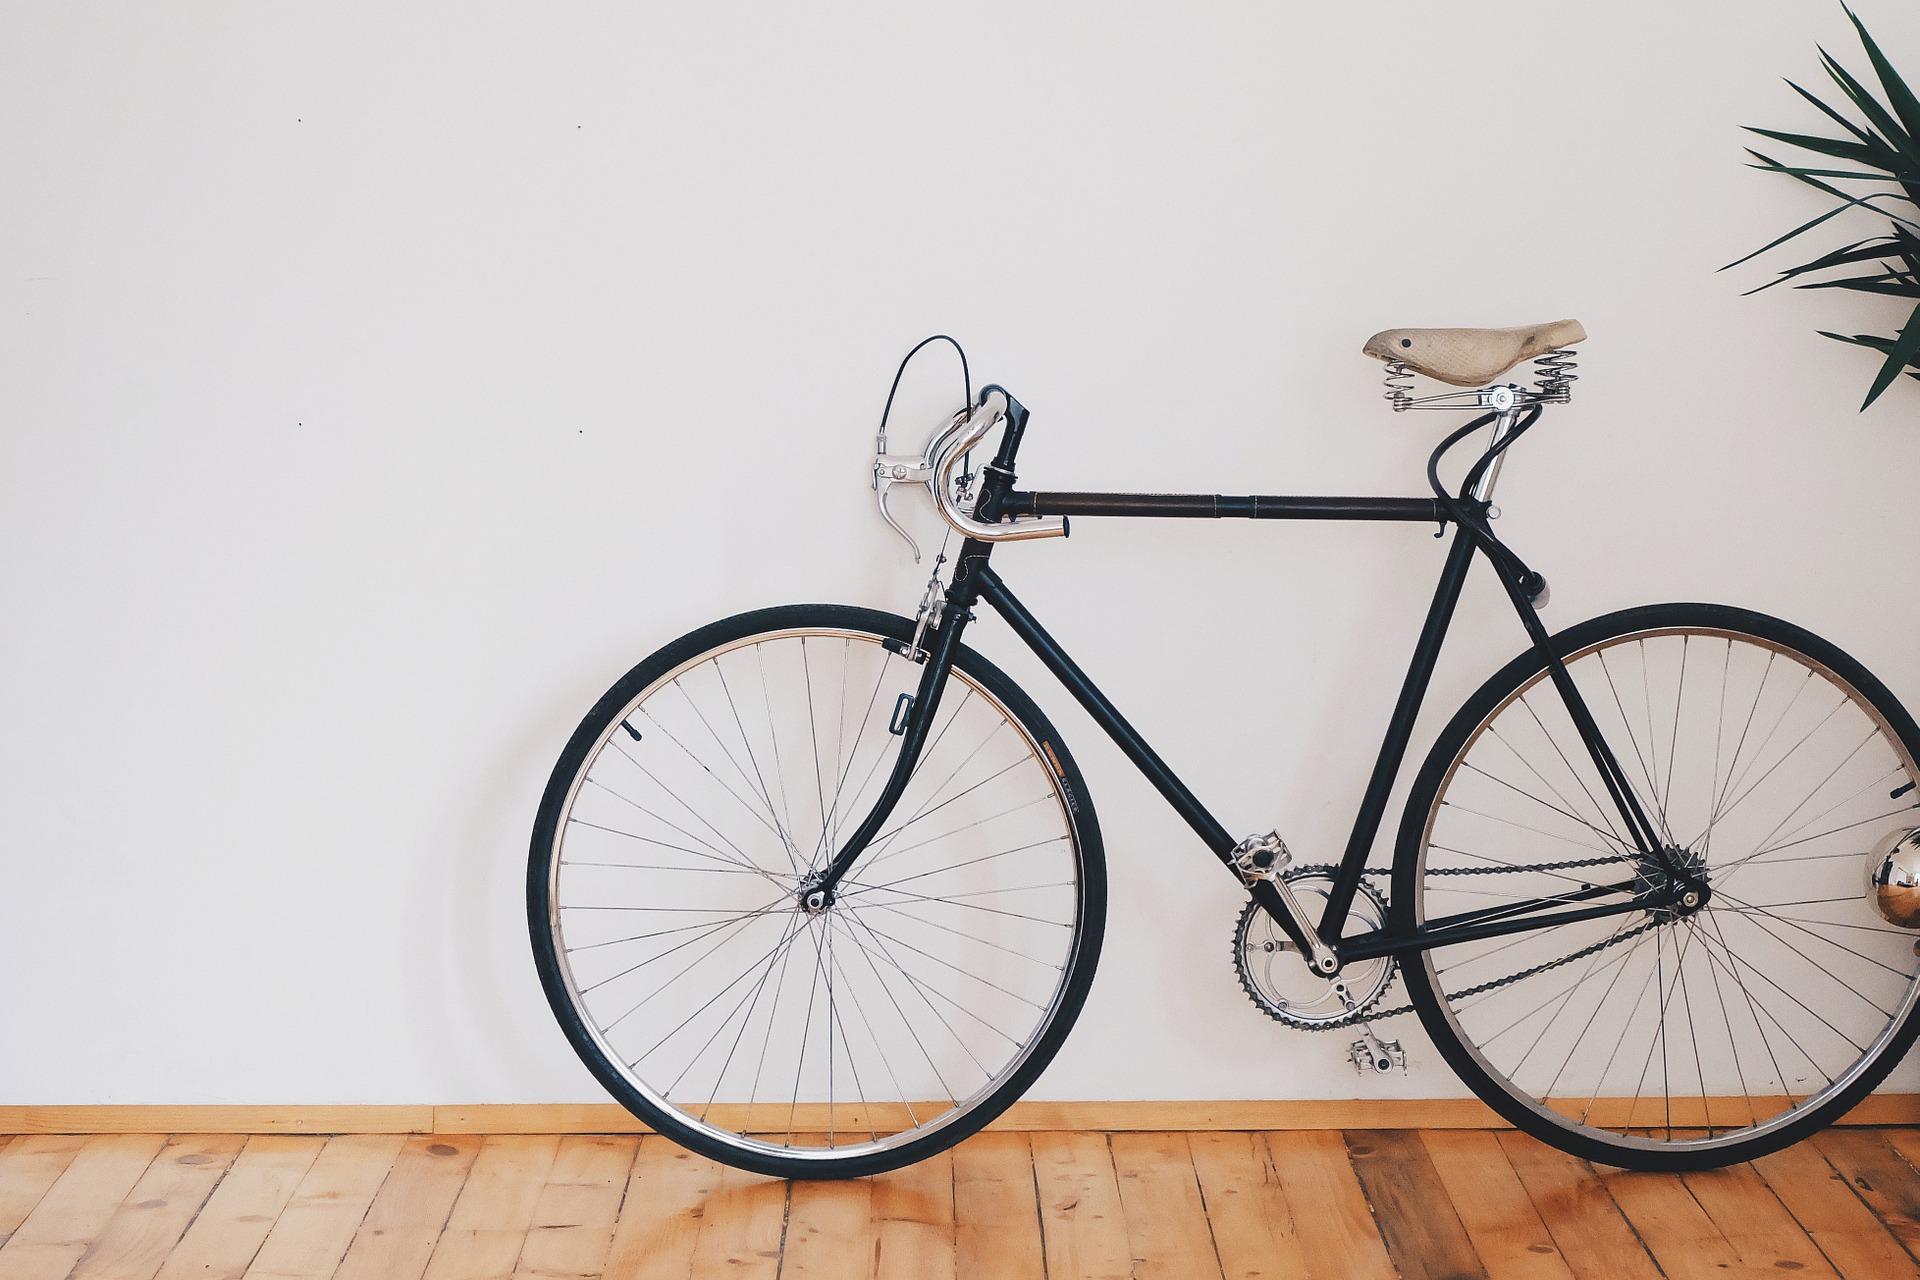 A bike parked inside